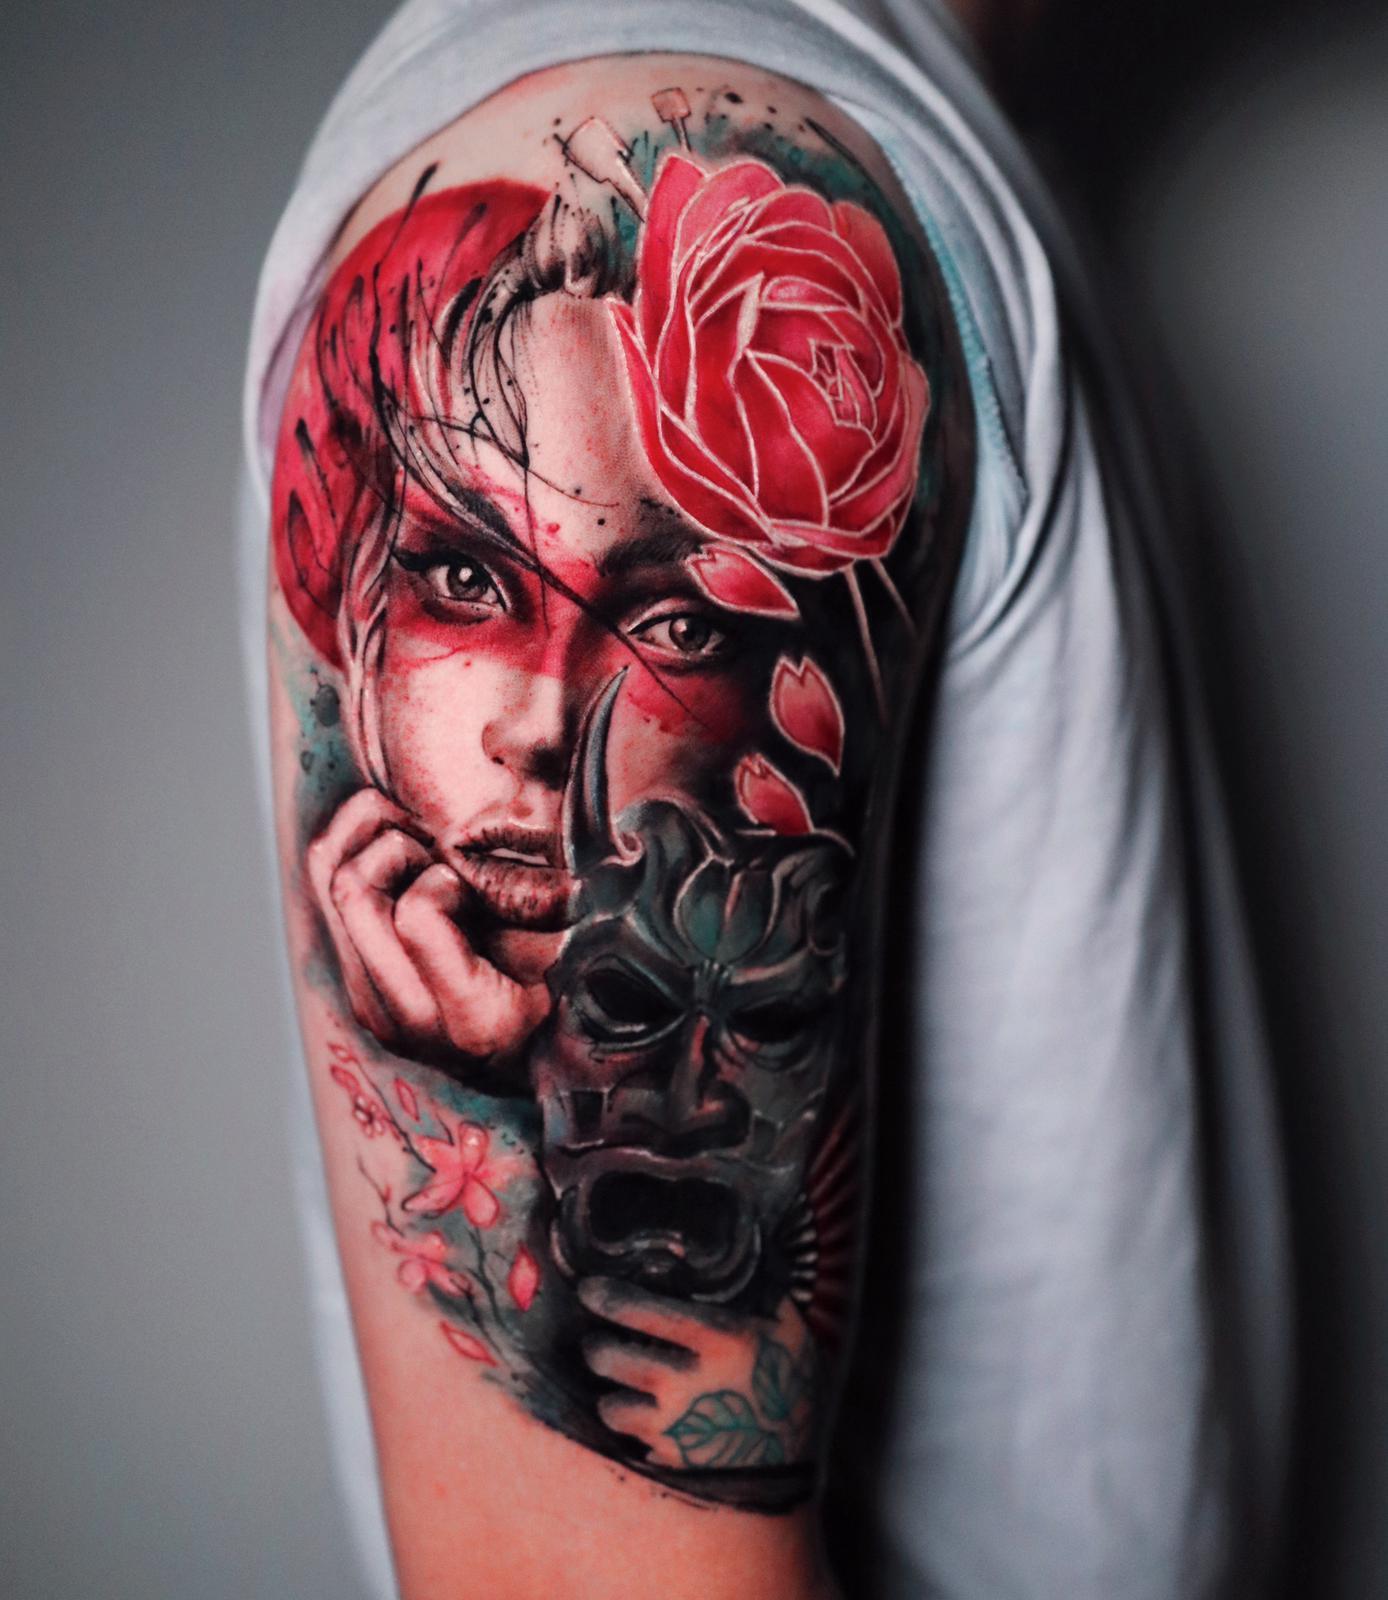 Watercolour photorealistic tattoo by Nico